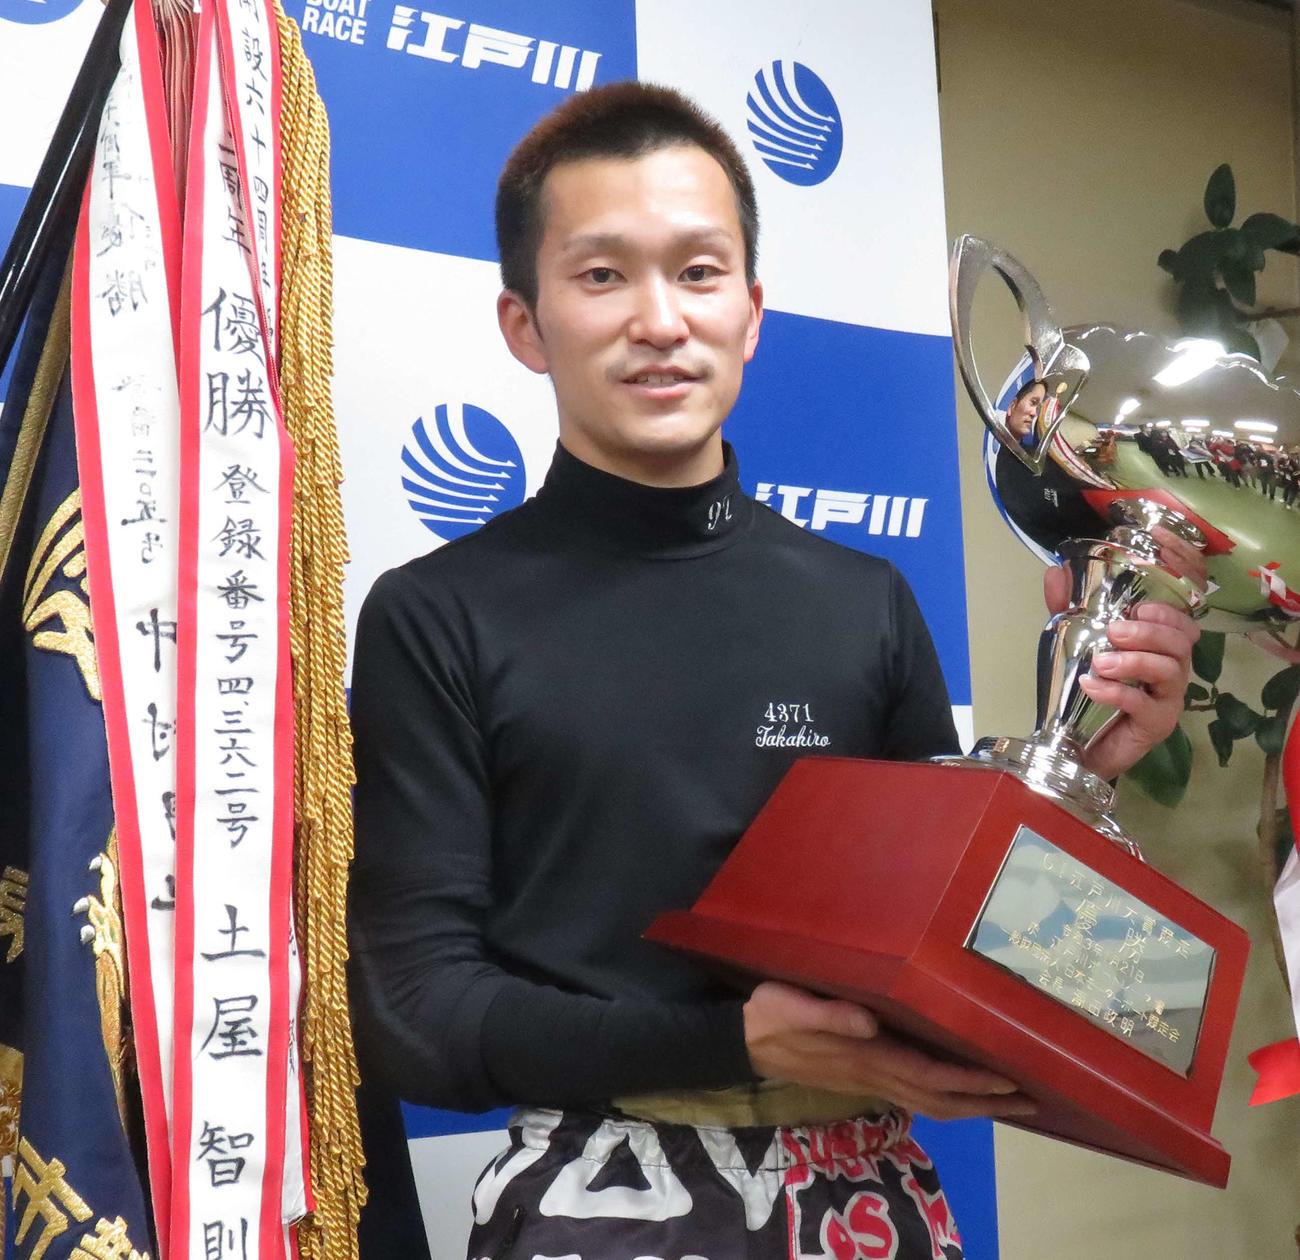 G1江戸川大賞優勝は西山貴浩(にしやまたかひろ)選手!福岡支部・ボートレース江戸川・周年記念・競艇